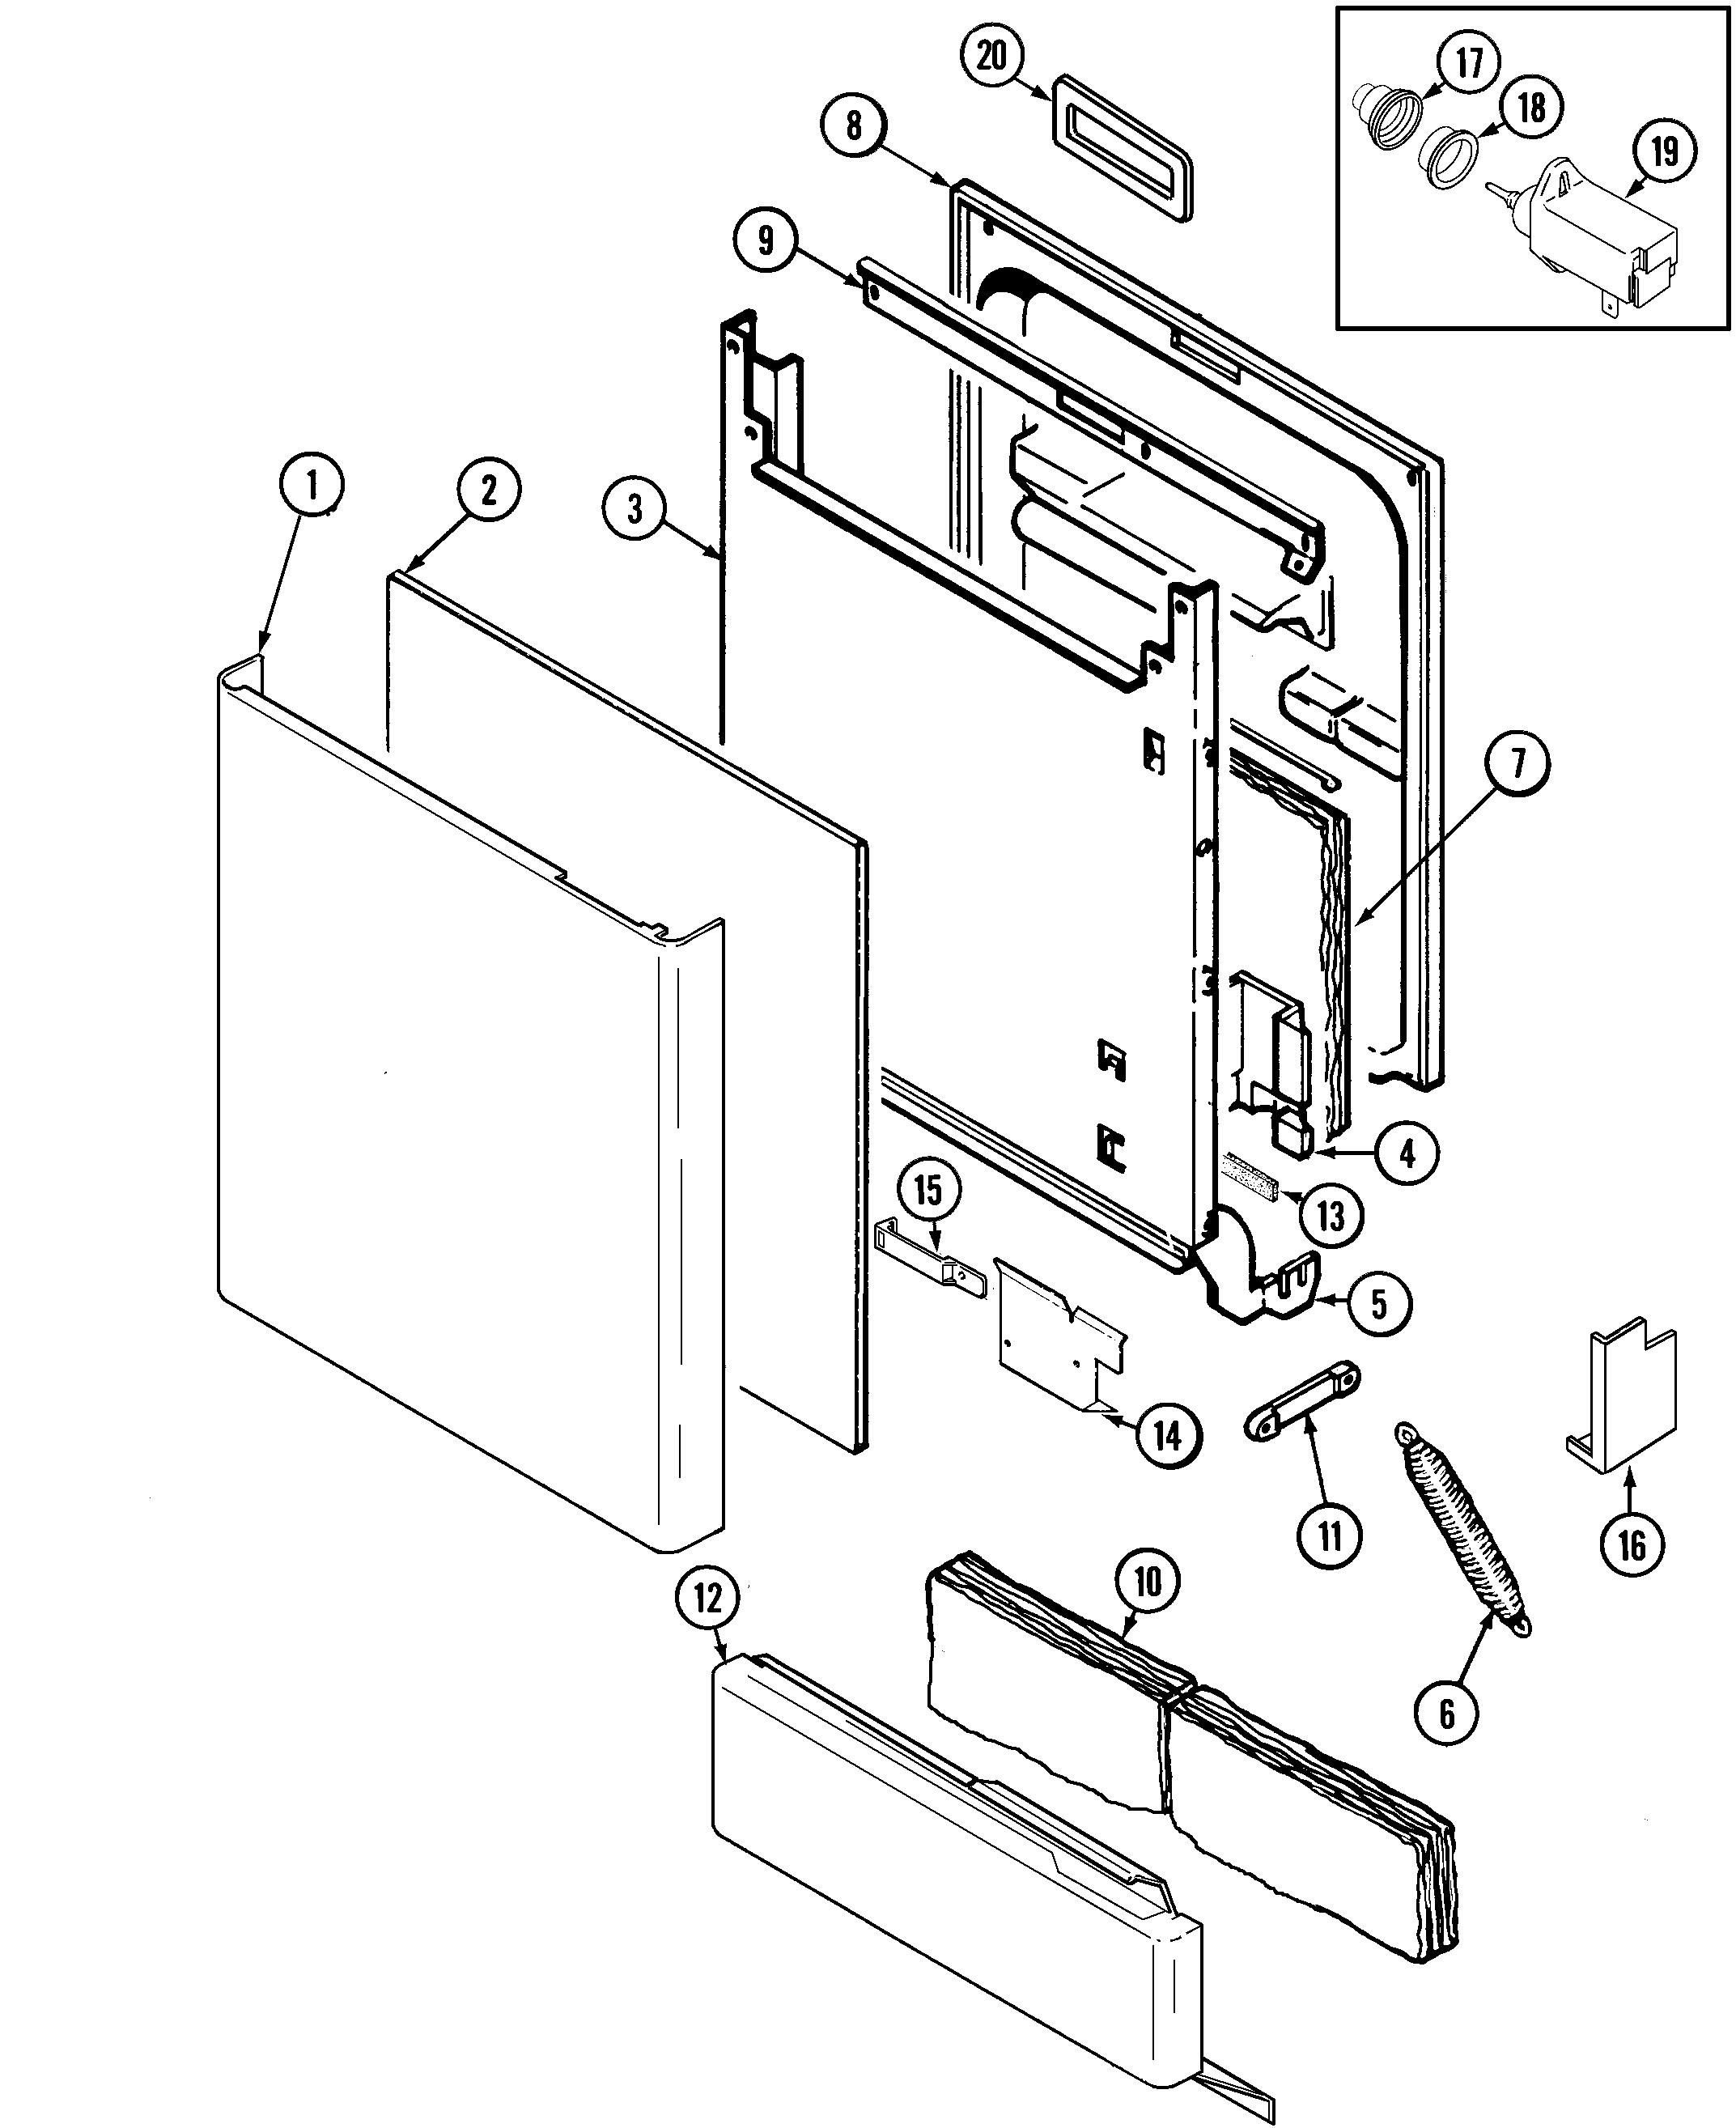 ge refrigerator wiring diagram problem simple flower parts lg model number location forum ~ elsavadorla